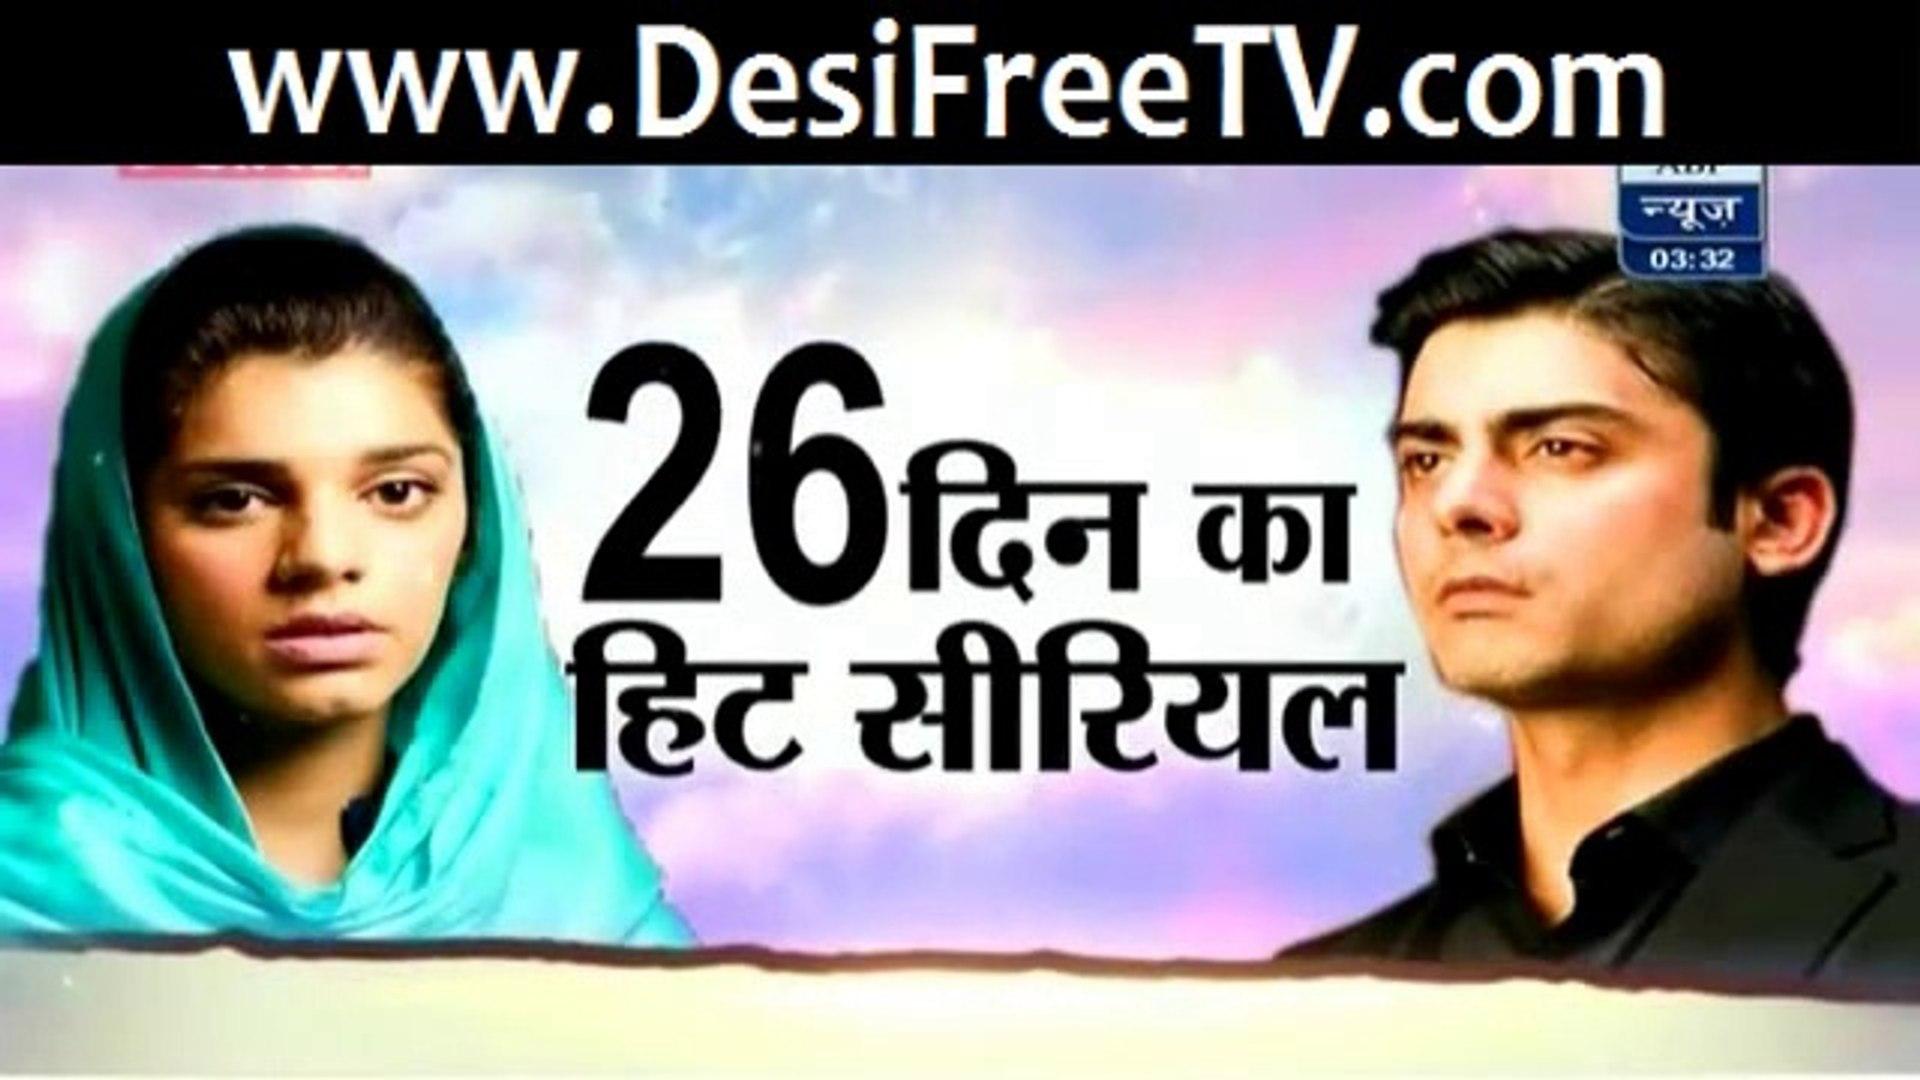 Zindagi Gulzar Hai Pakistani drama serials win hearts in India ABP News Special Report on Zindagi Gu